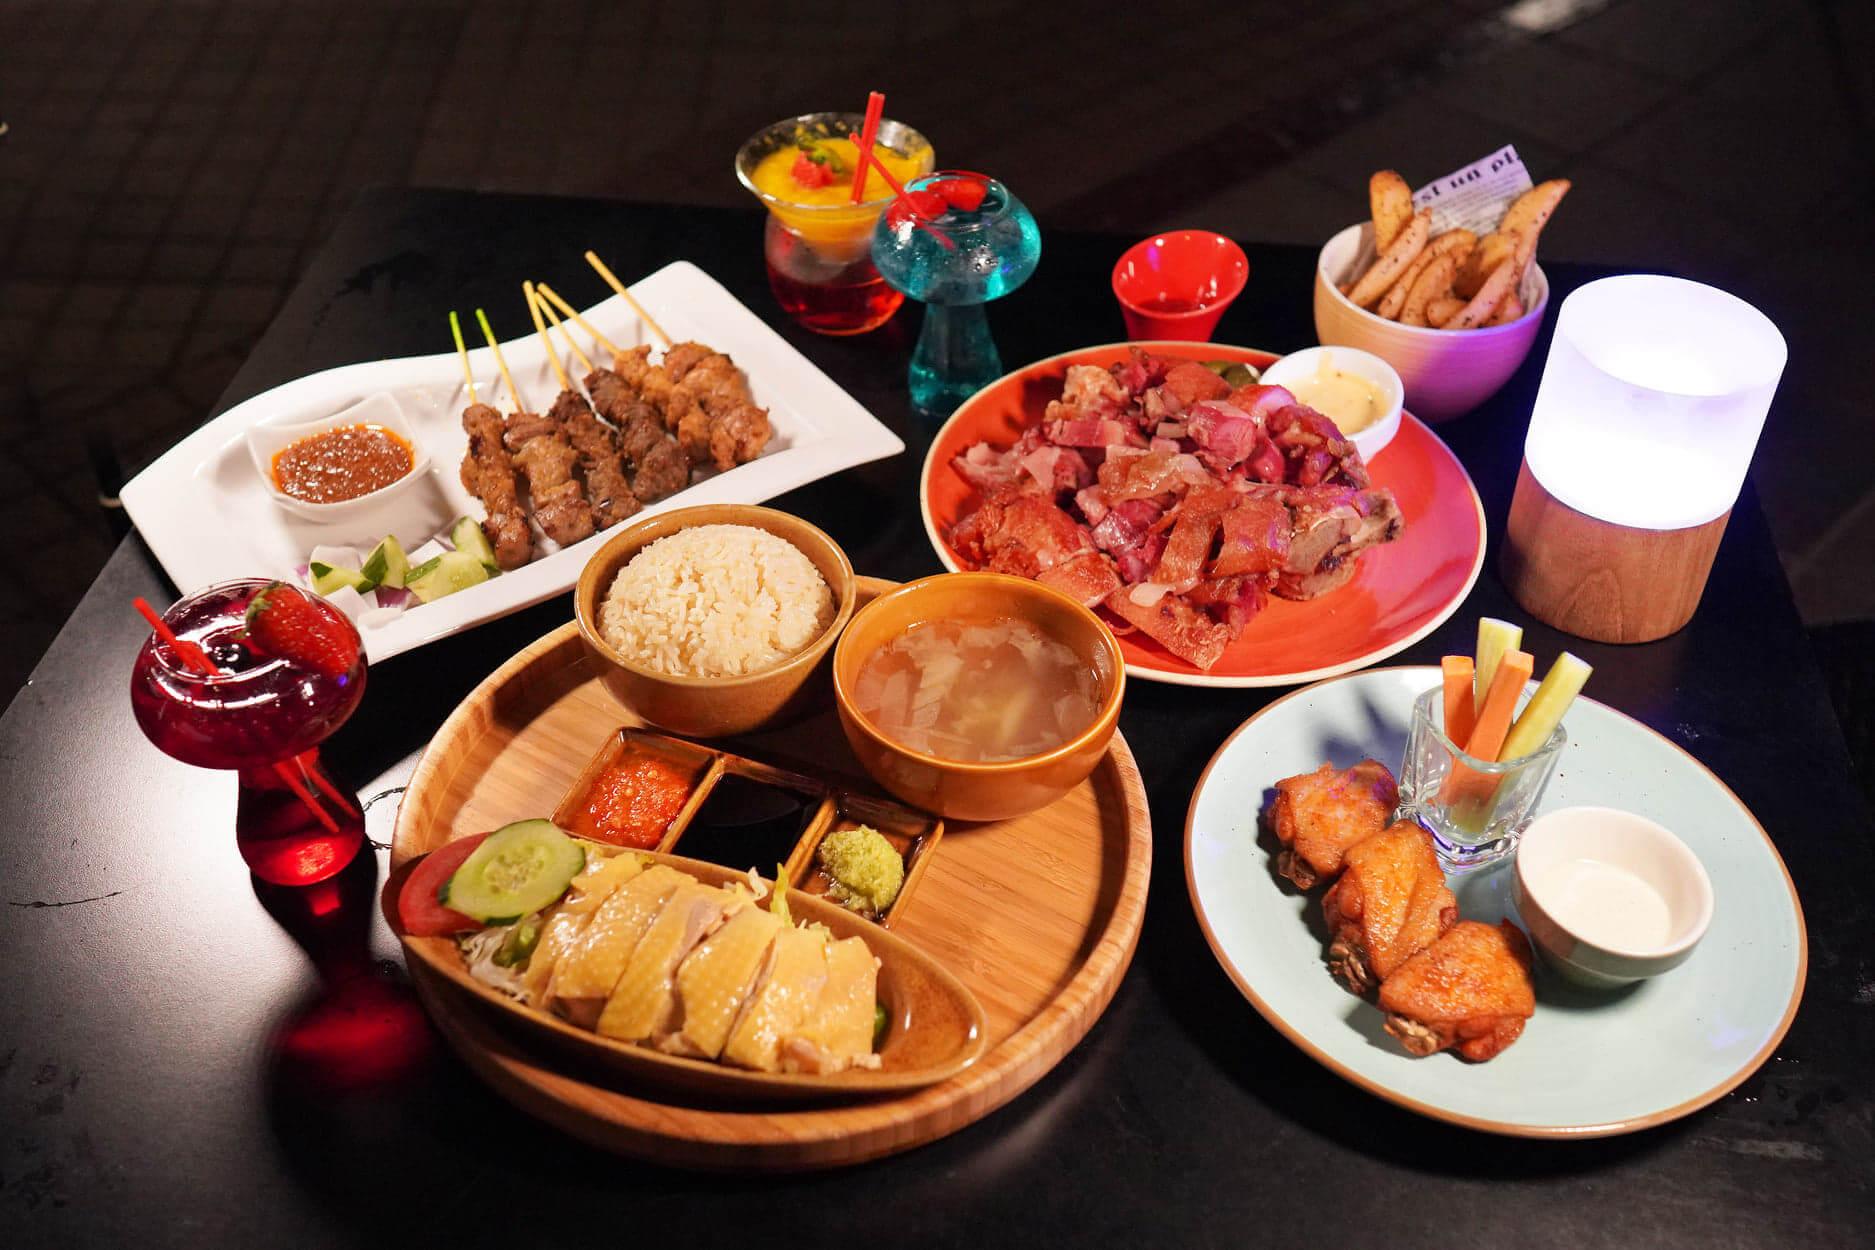 Pierside Bar & Restaurant最新「1-2-3 Combo」優惠,提供一系列超抵嘅美酒及小食!